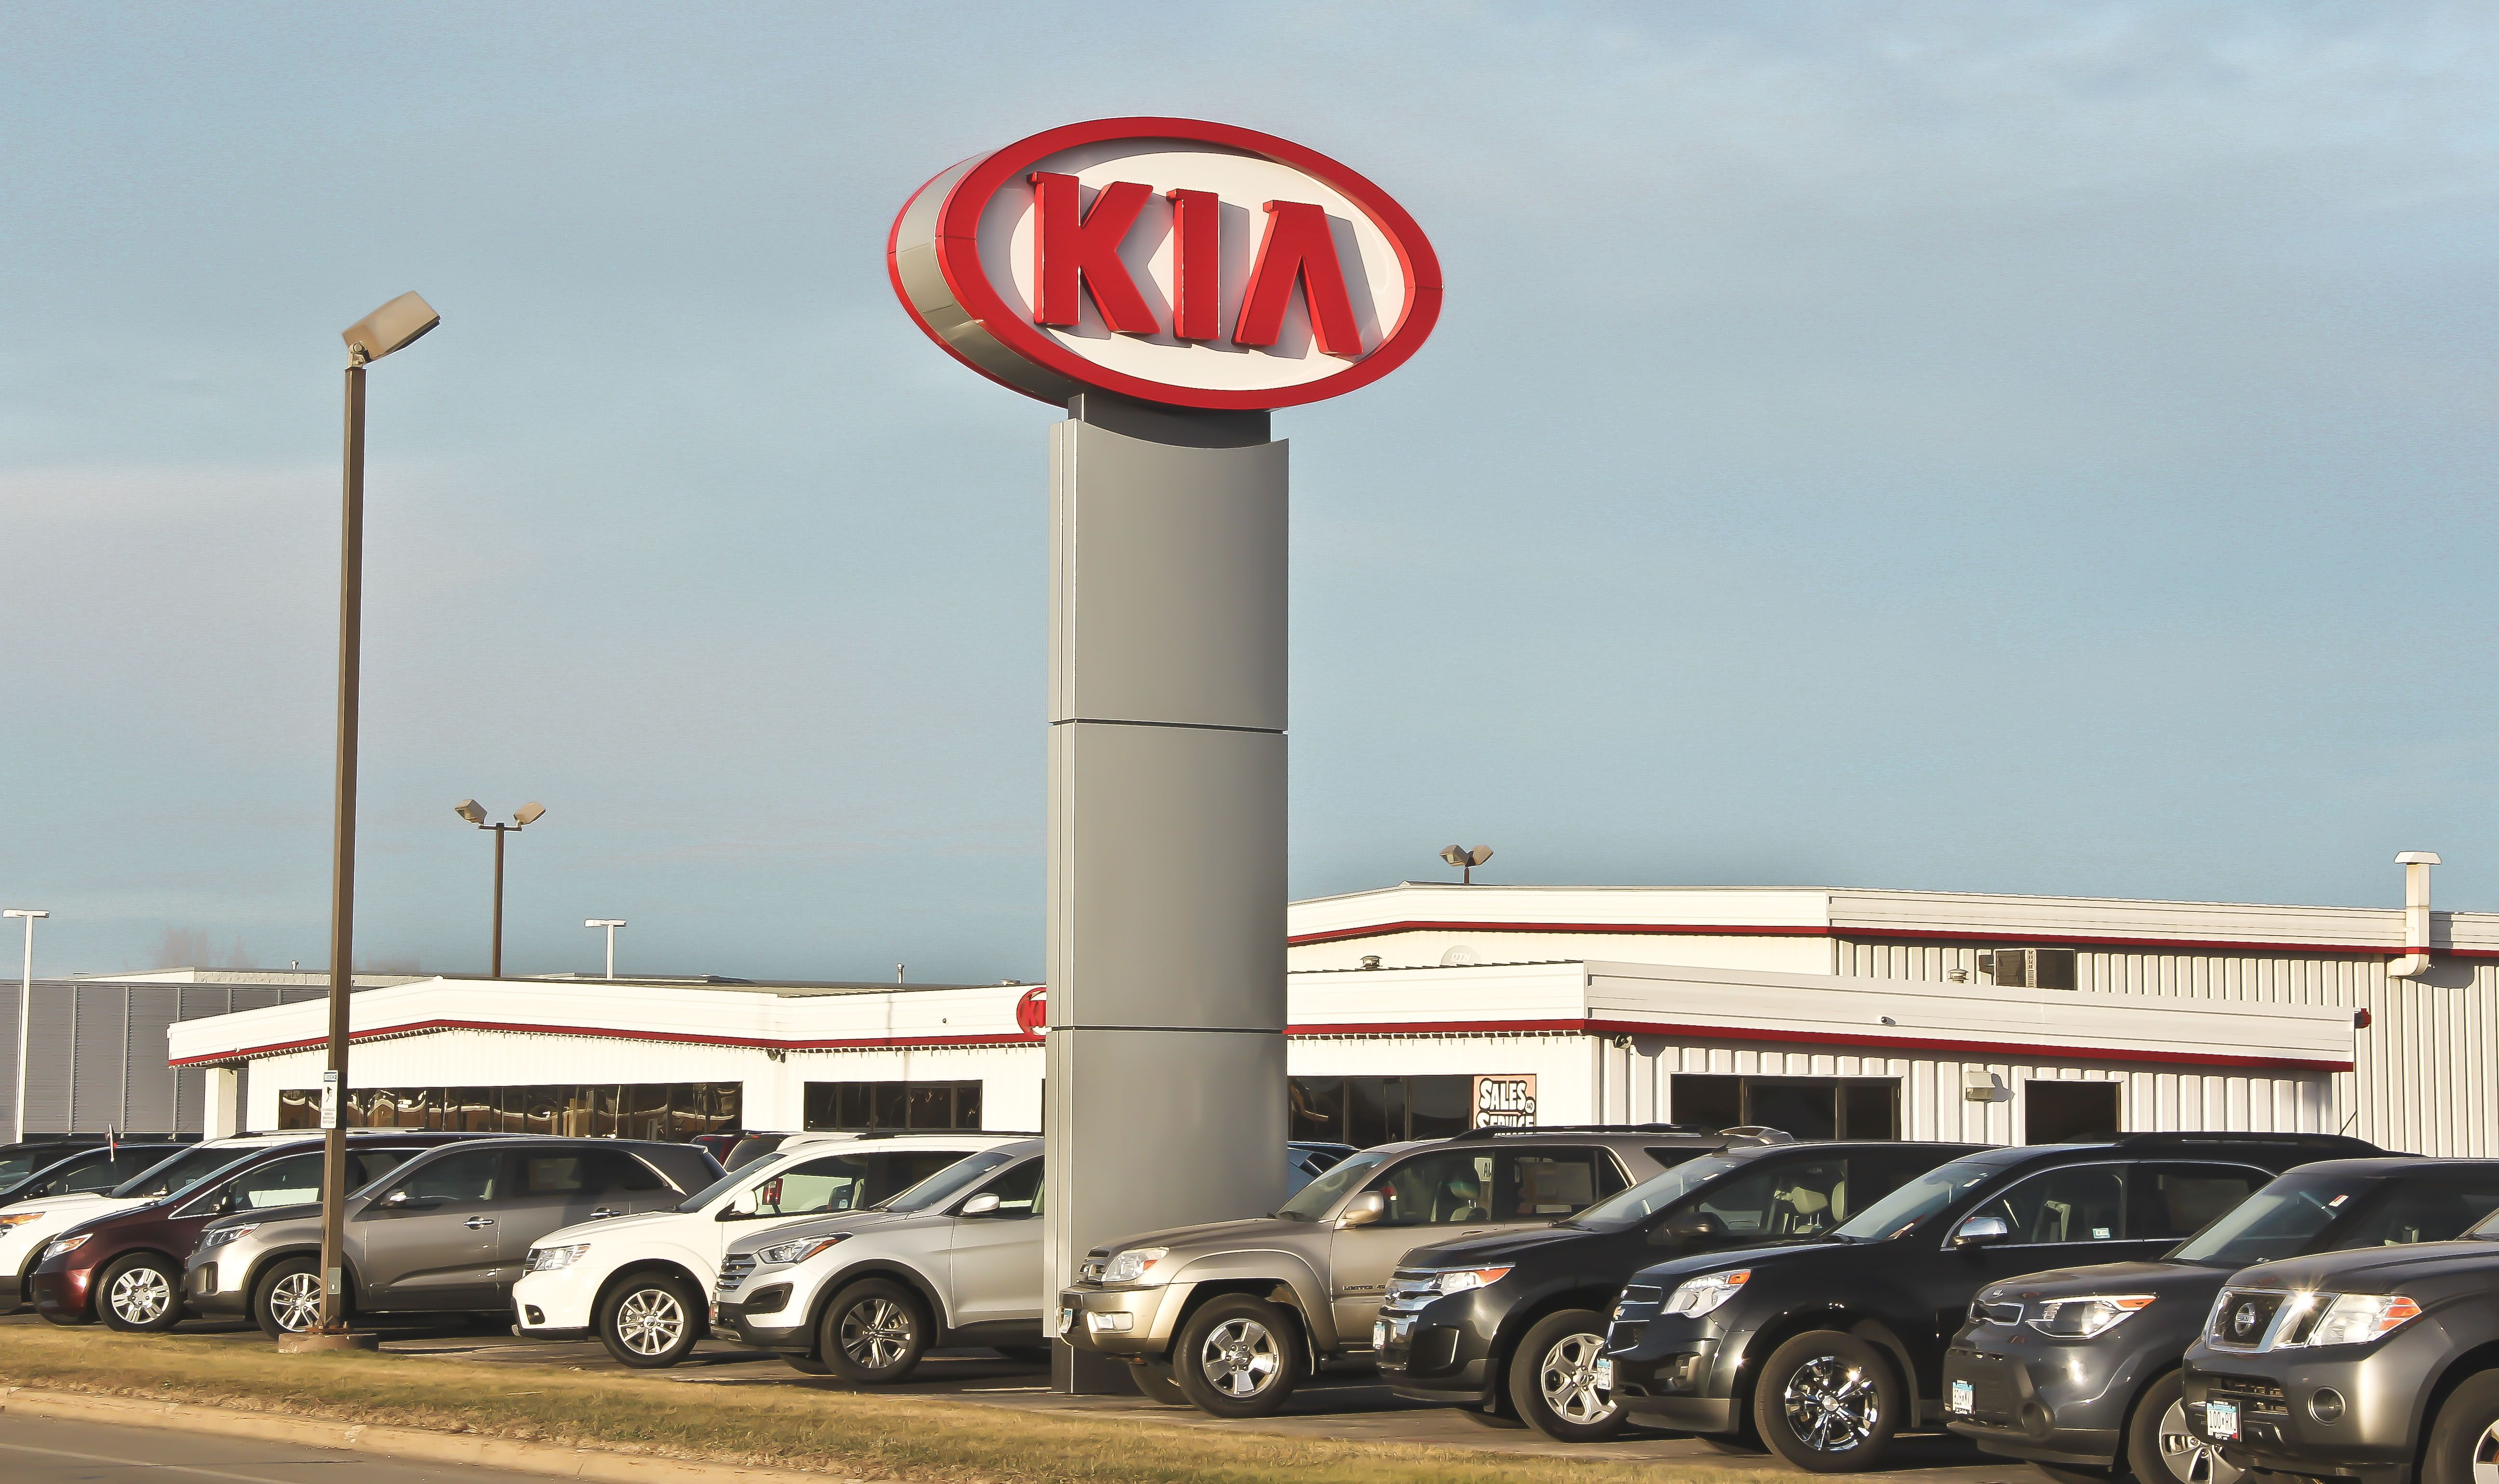 Car Dealerships In Rochester Mn >> Tom Kadlec Kia 4444 Hwy 52 N Rochester Mn 55901 Tour Our